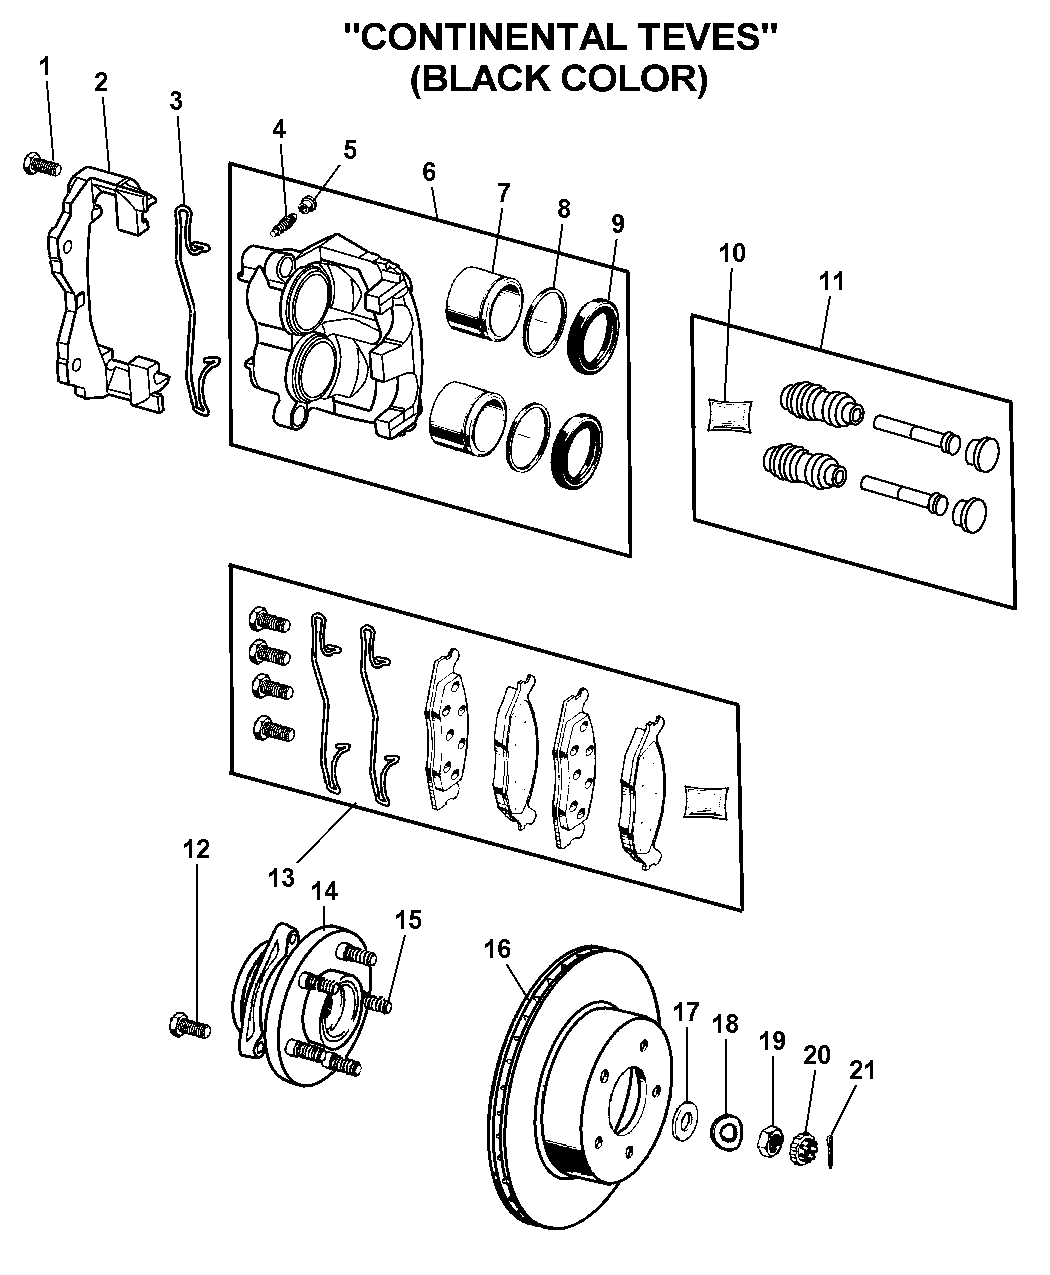 bhkh5649